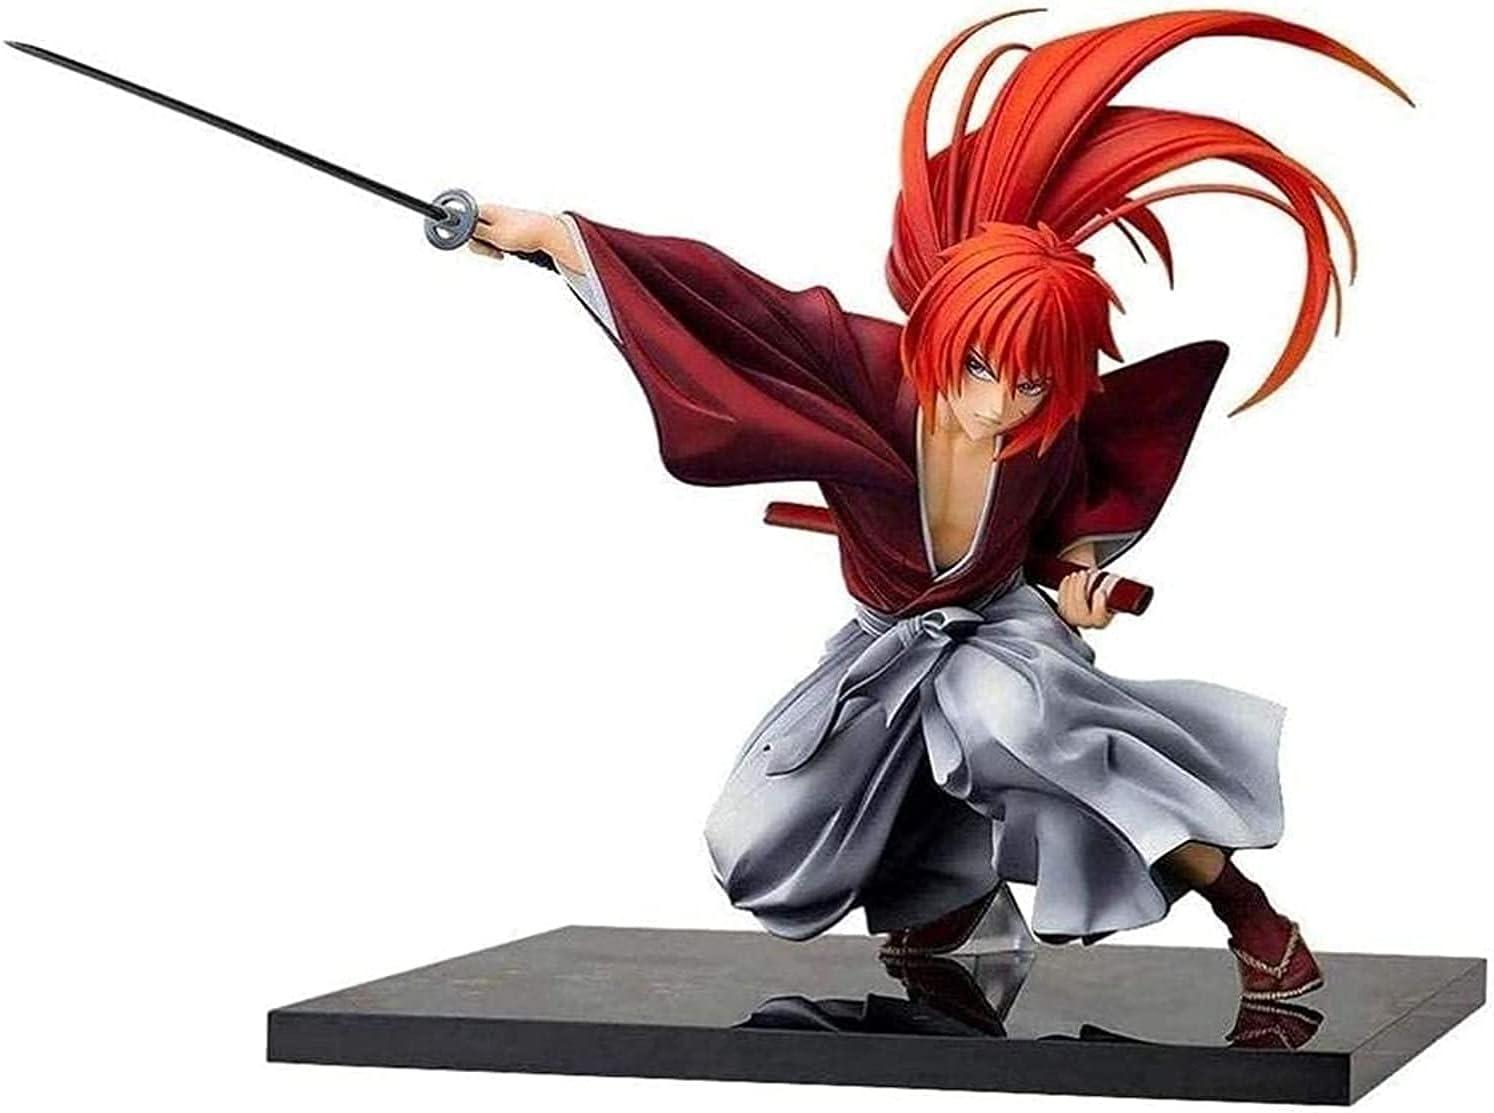 Limited time sale Rurouni Kenshin Anime Action Figure PVC C Himura Figures Branded goods